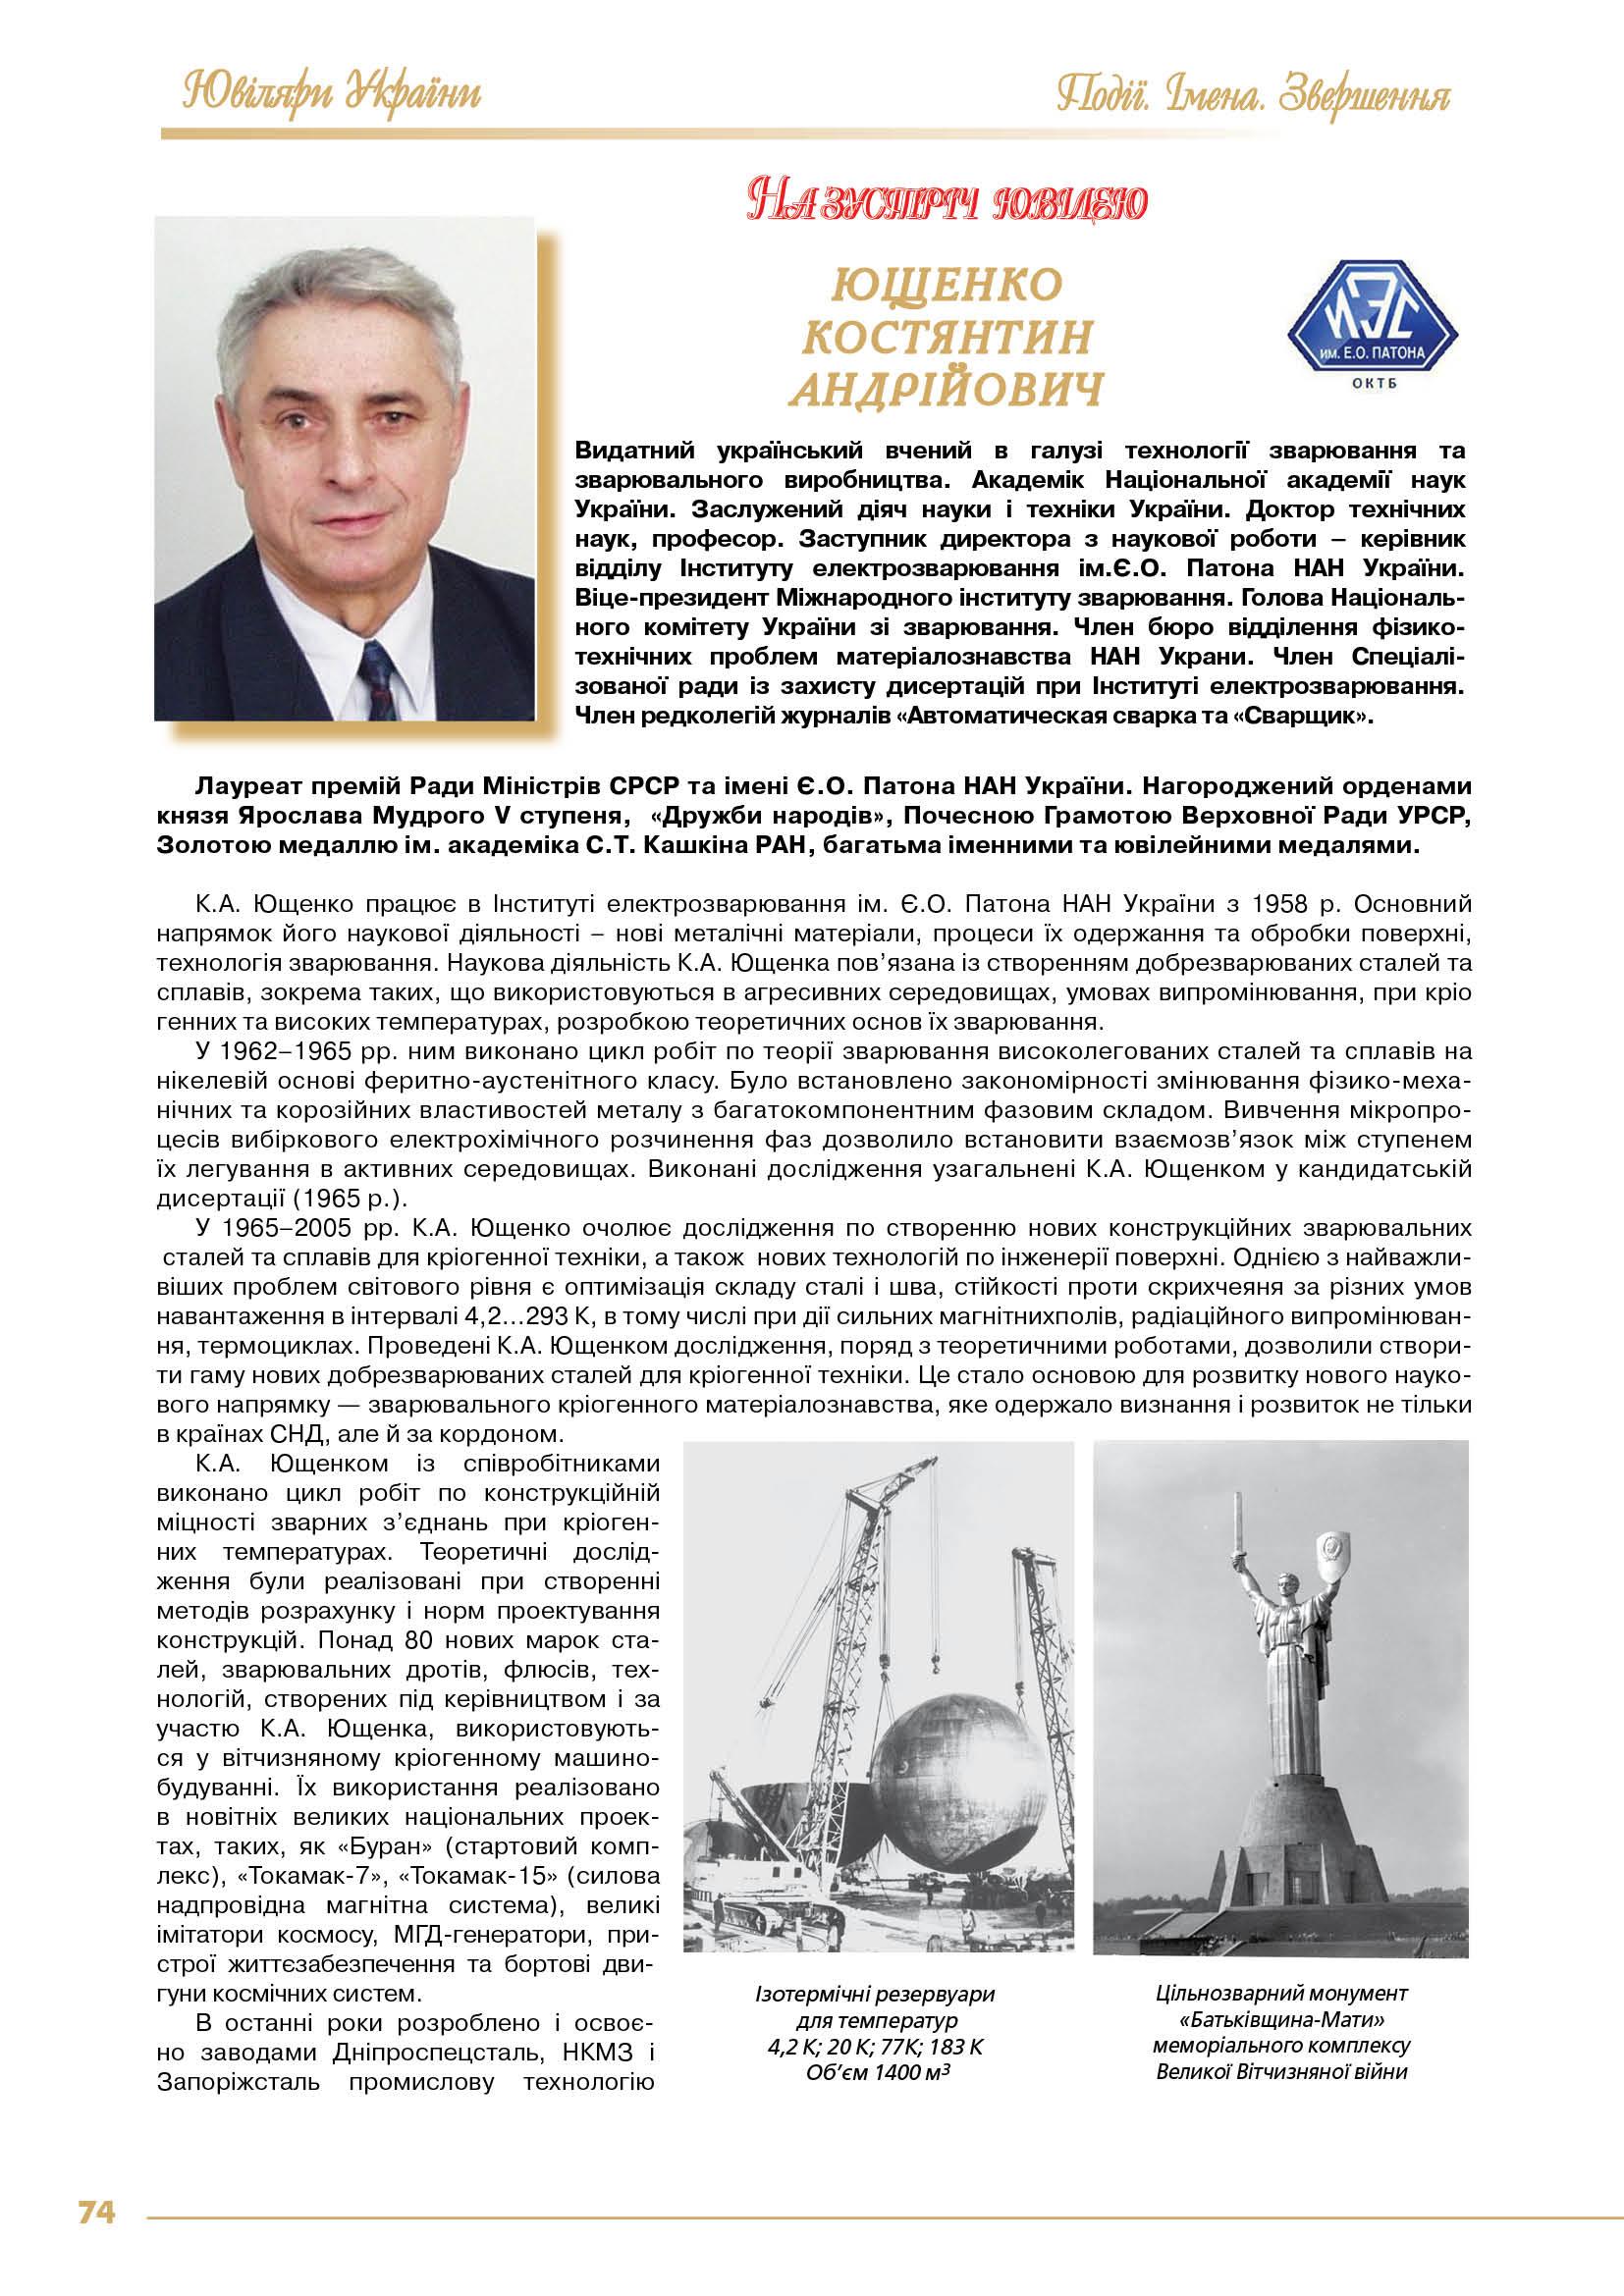 Ющенко Костянтин Андрійович